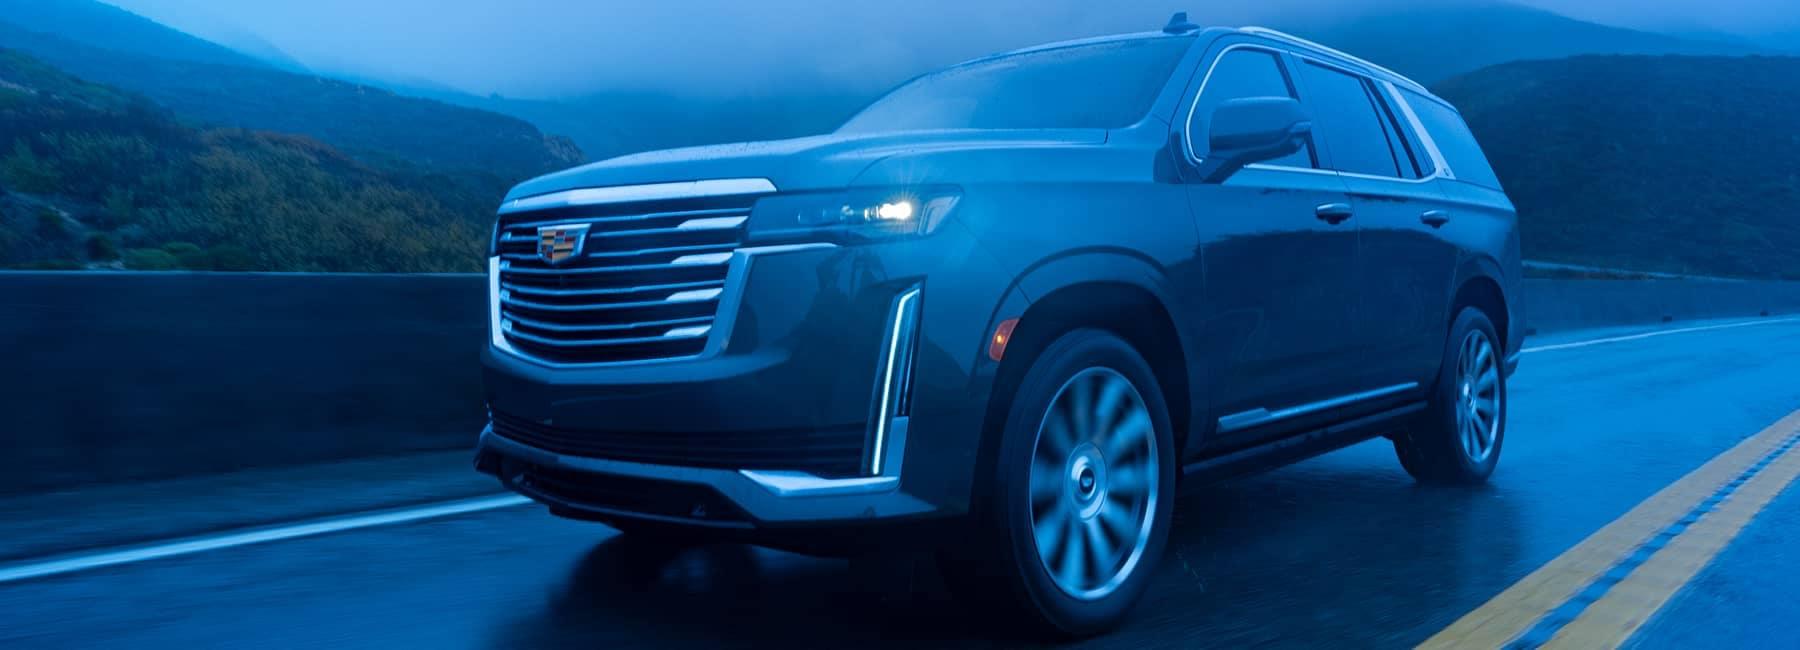 2021 Cadillac Escalade in evening fog